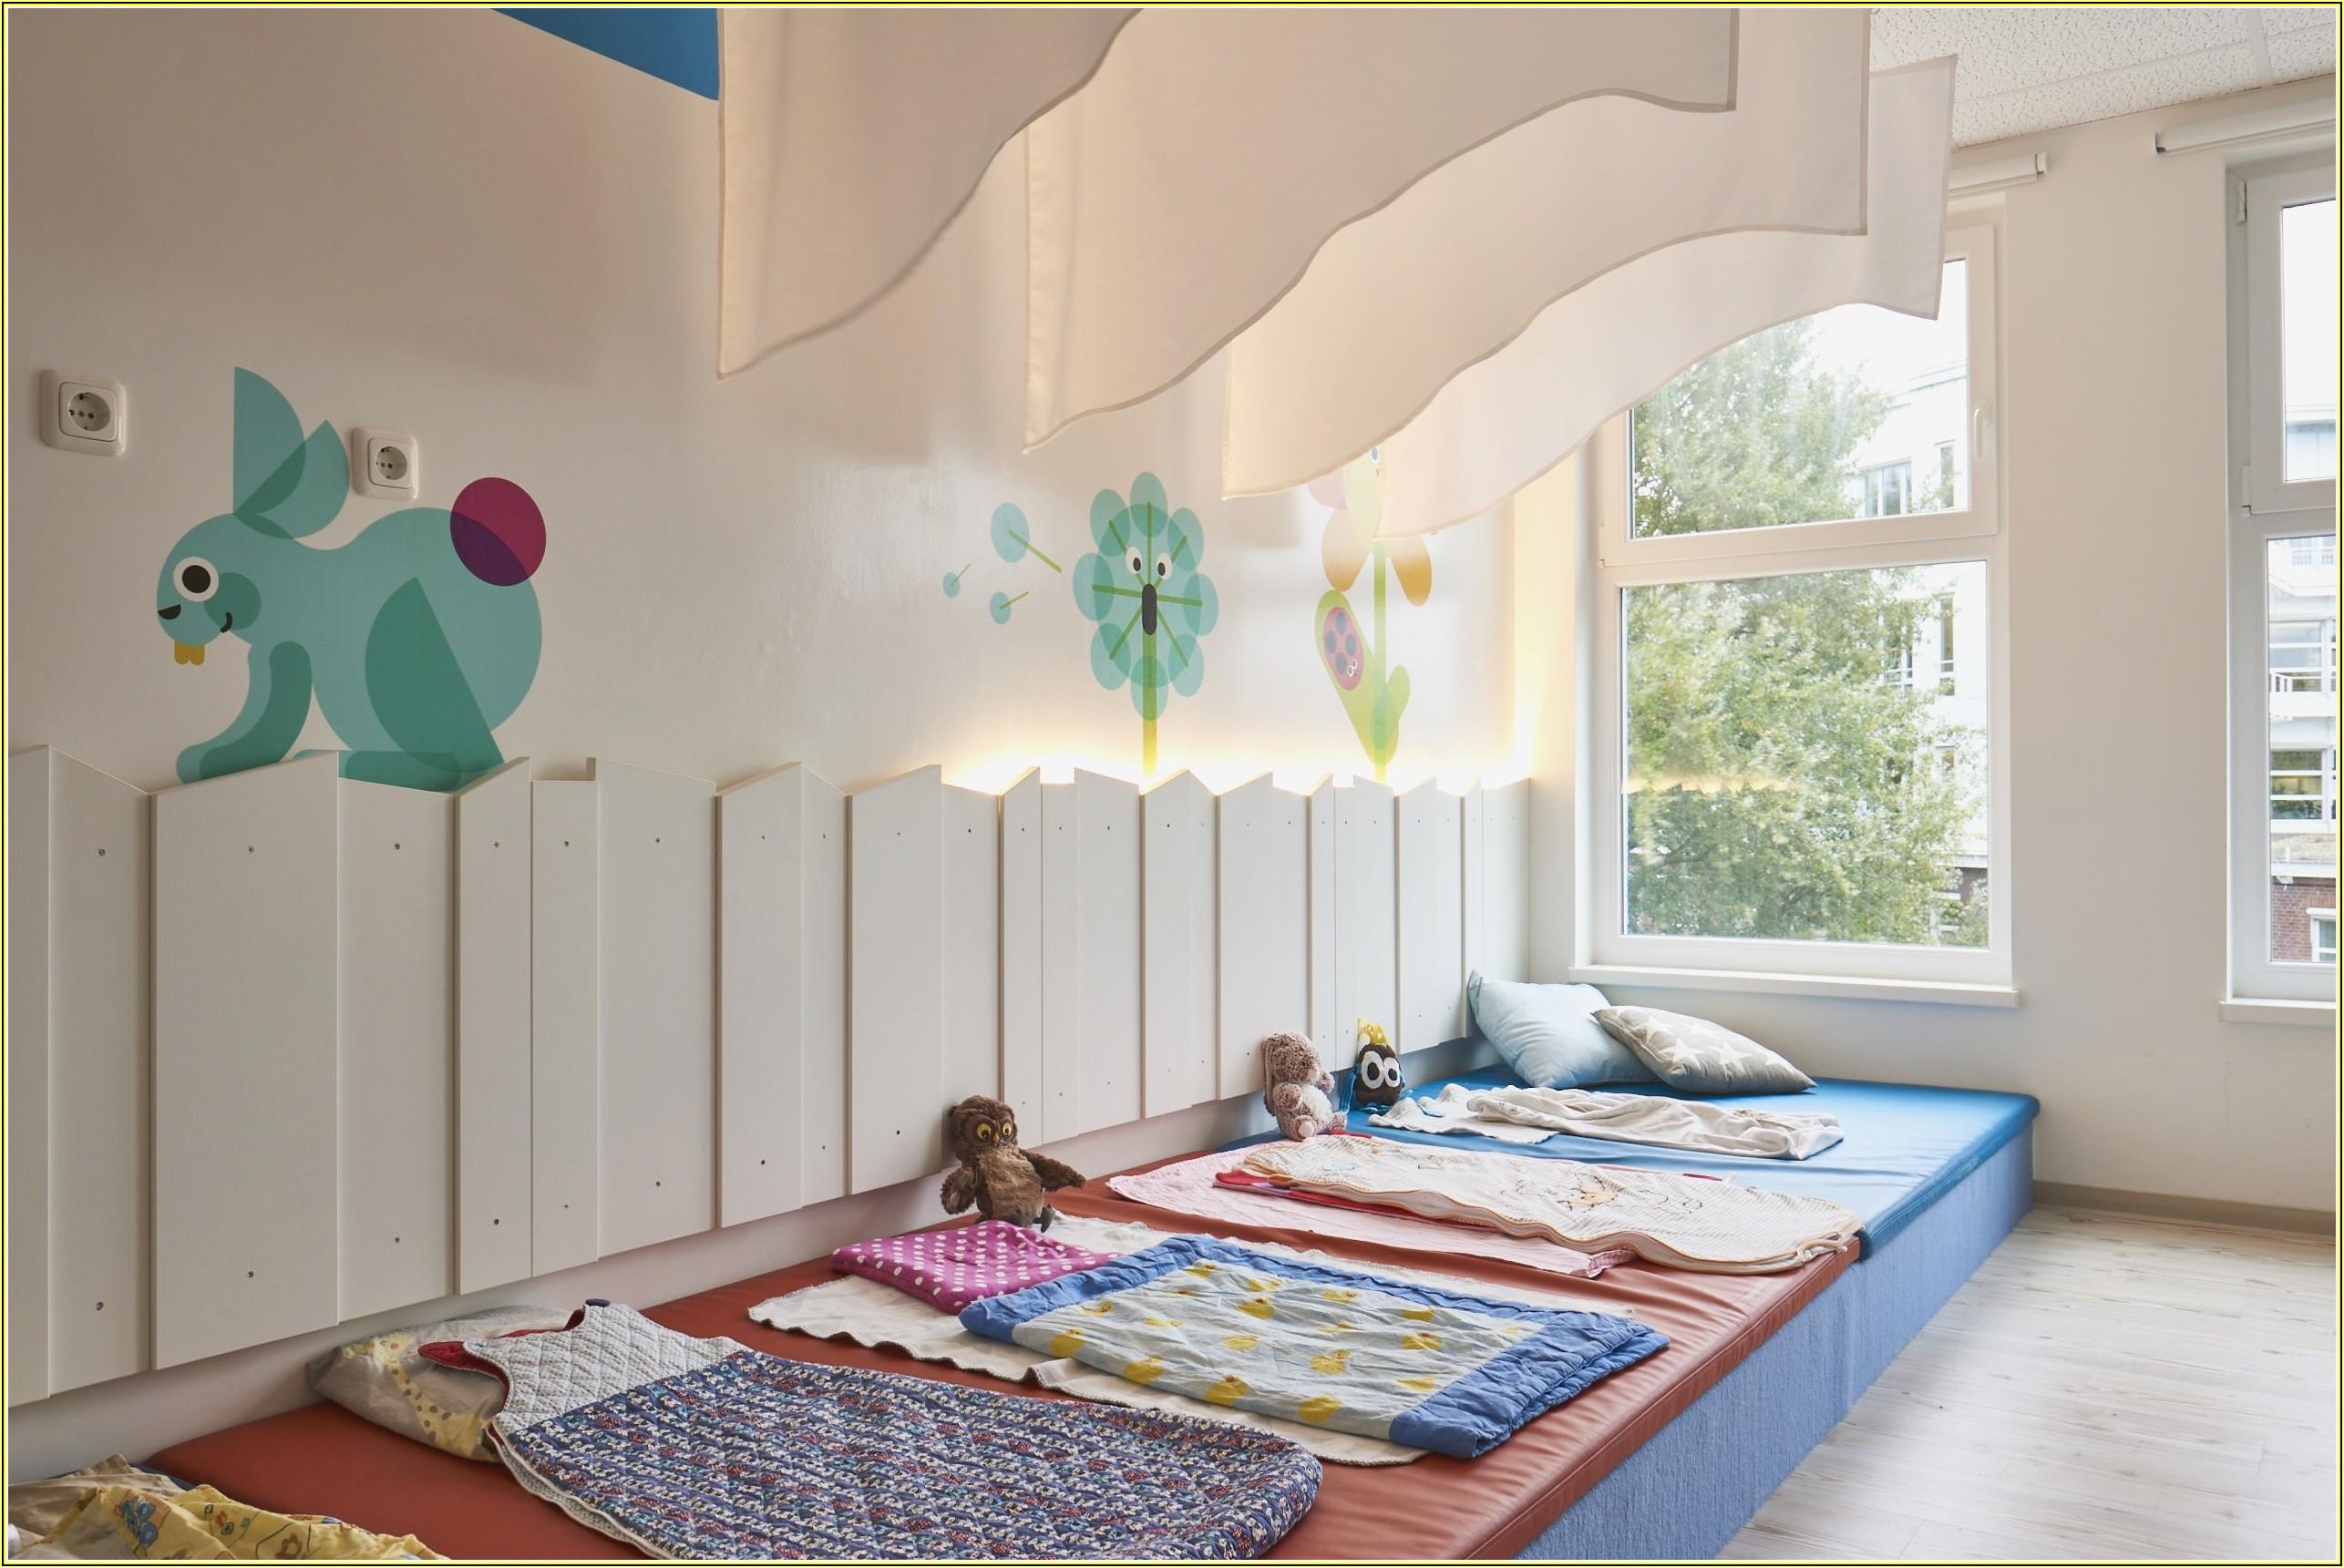 Kita Kinderzimmer Verwaltung Hamburg